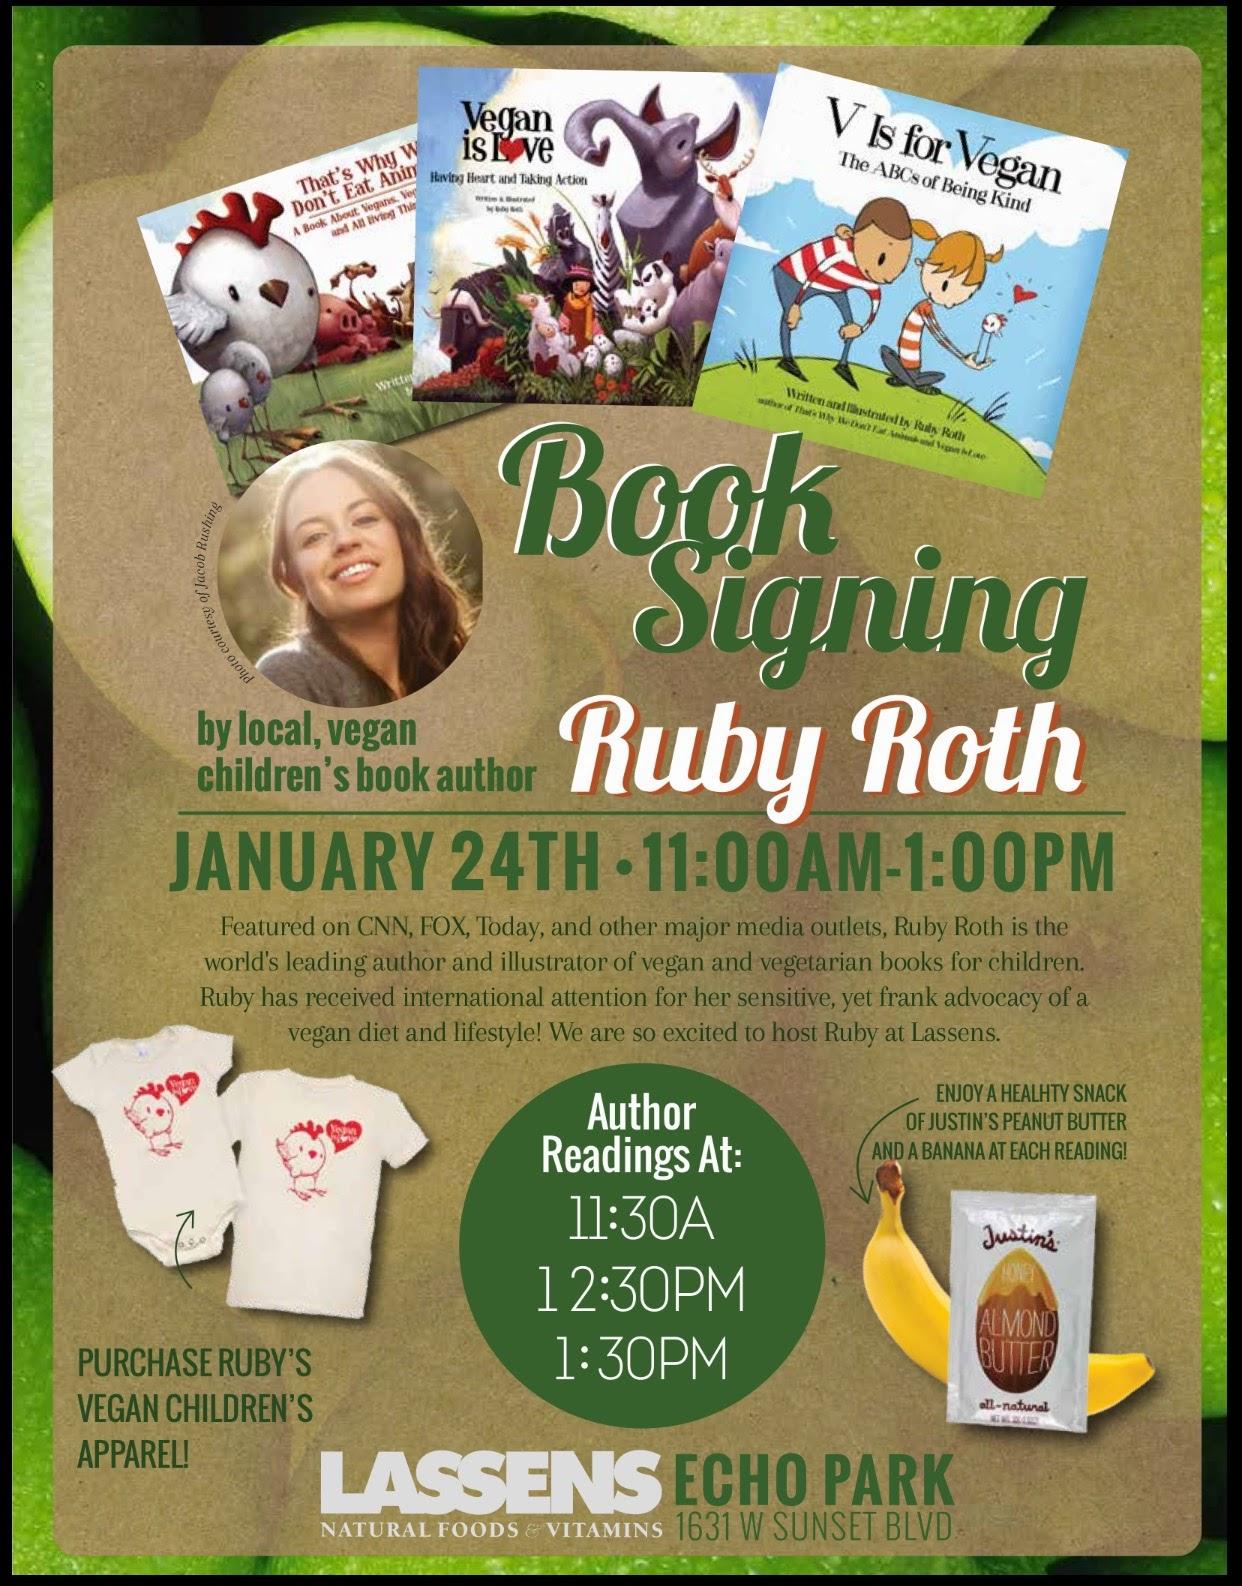 Ruby+Roth, Thats+why+we+don't+each+animals, vegan+kids, Echo+Park+Lassens